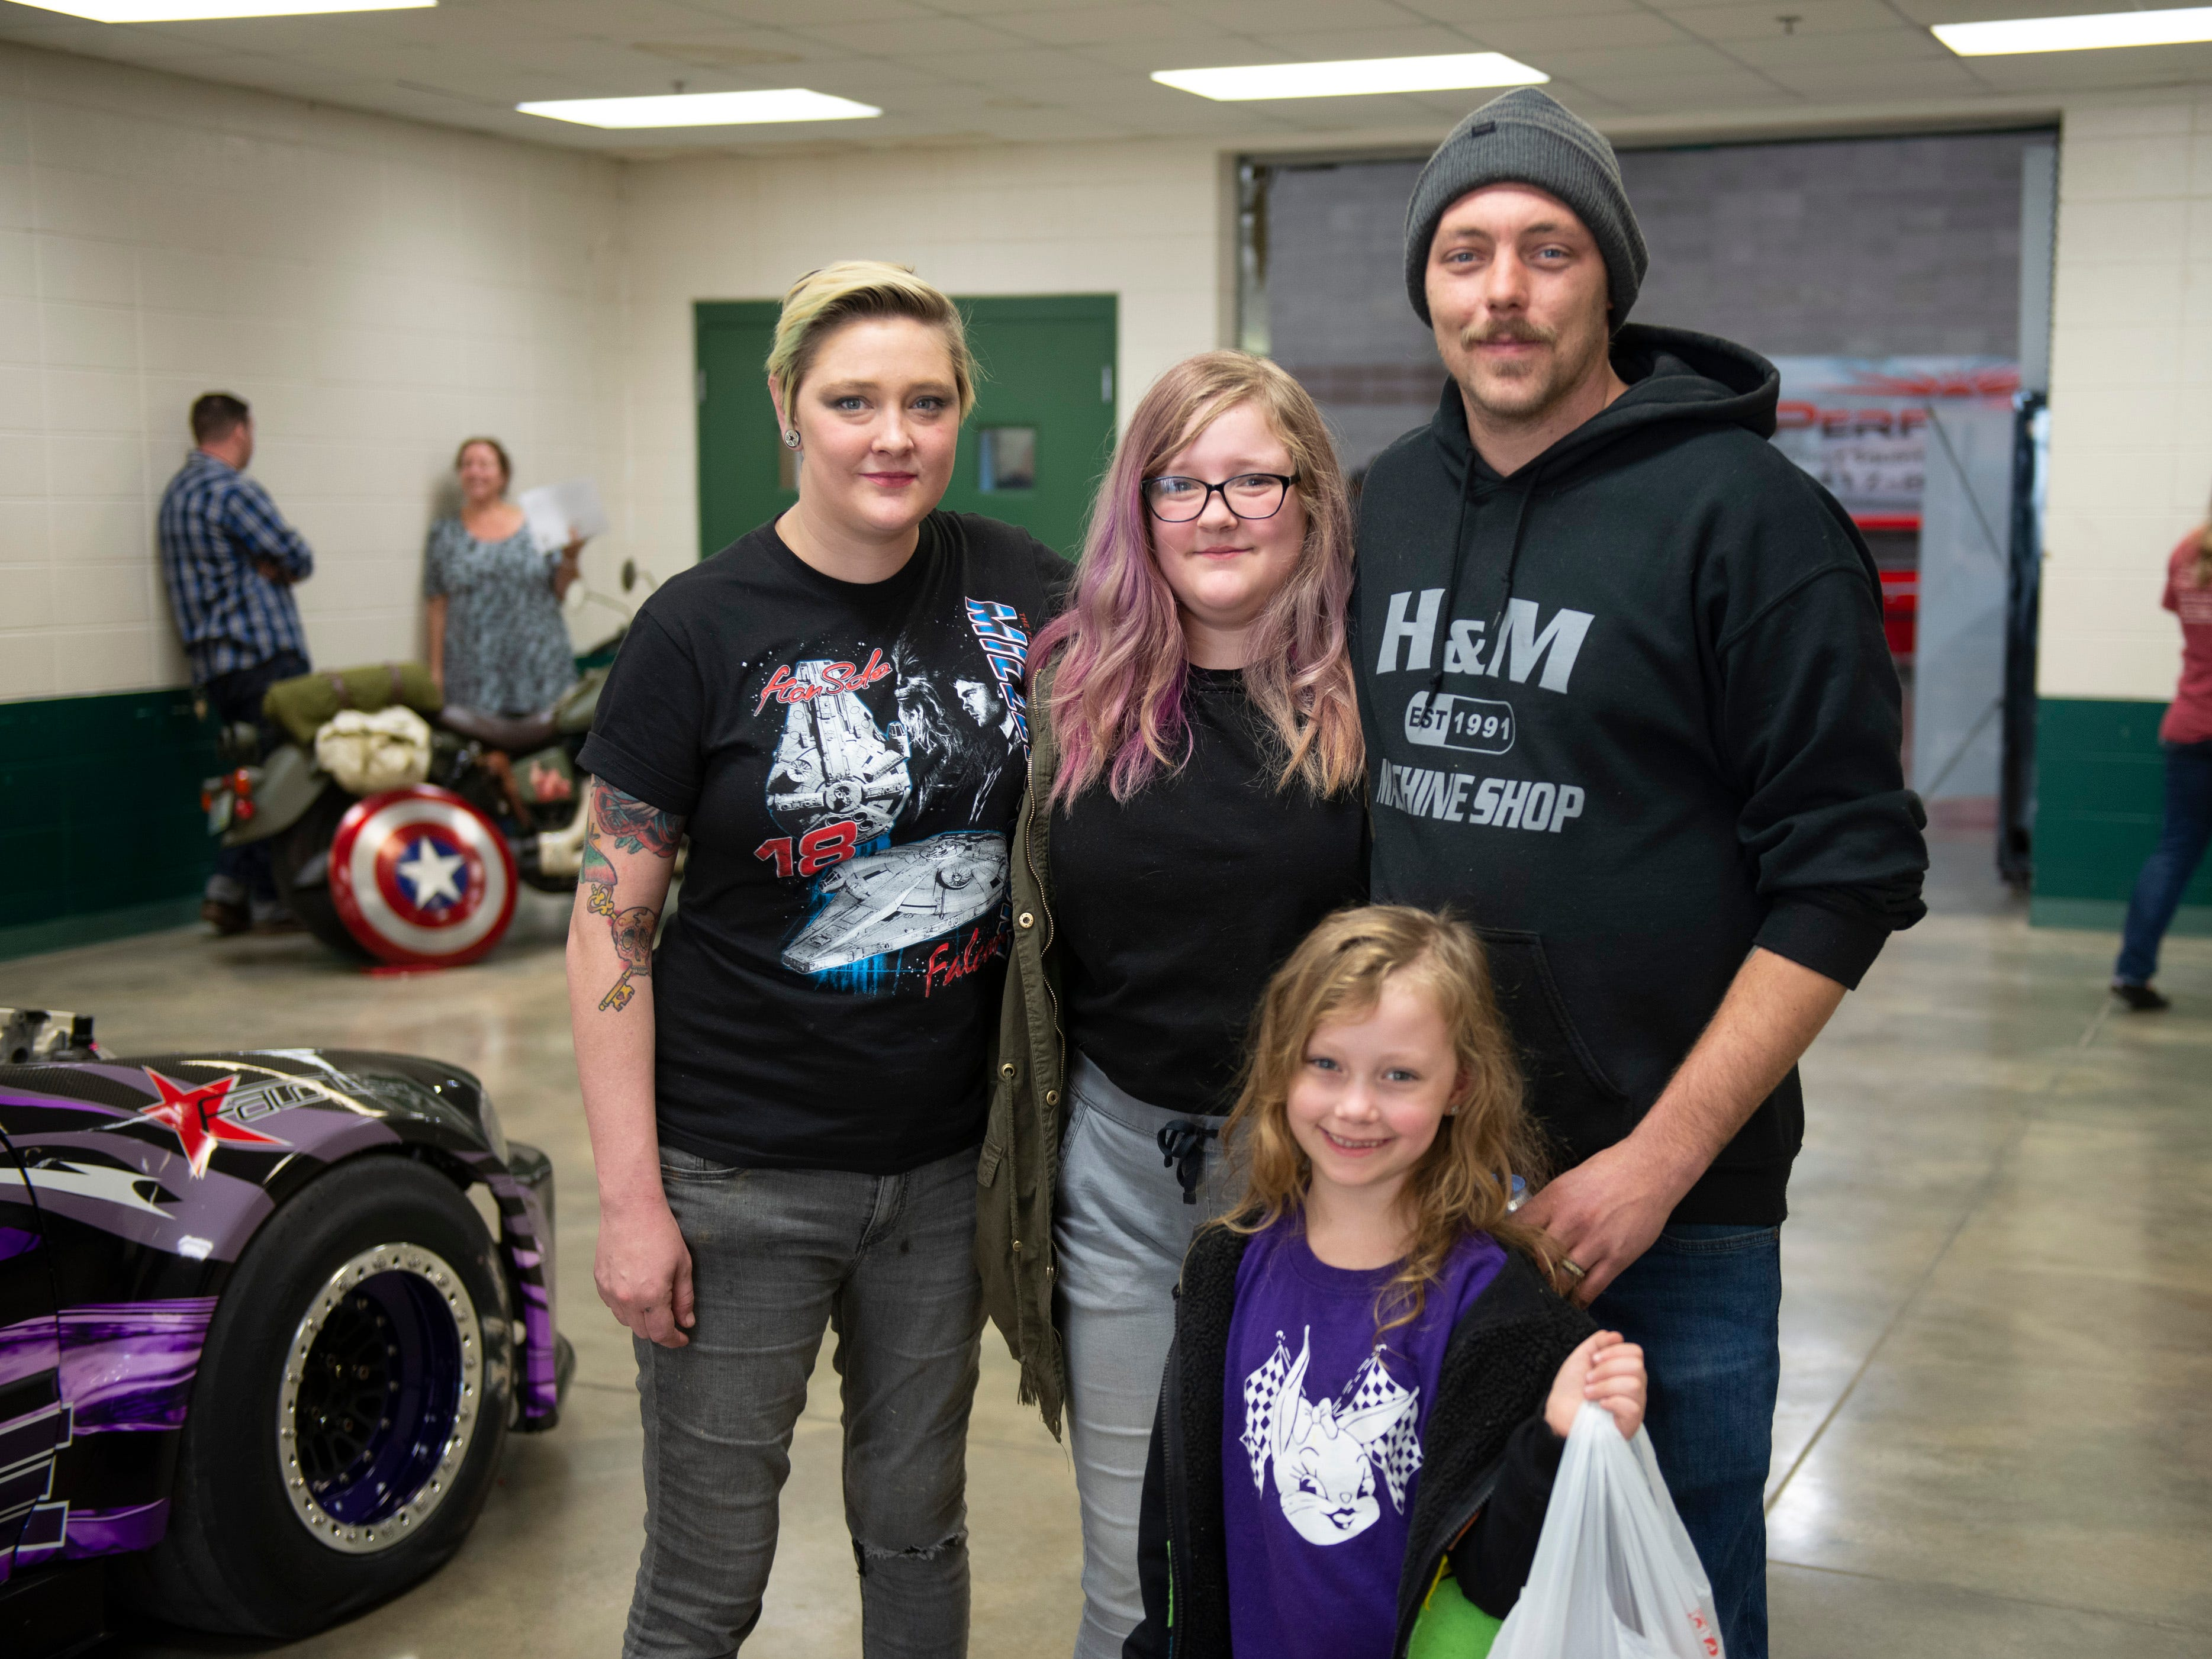 Kenna, Mike, Nanci, and Jaey